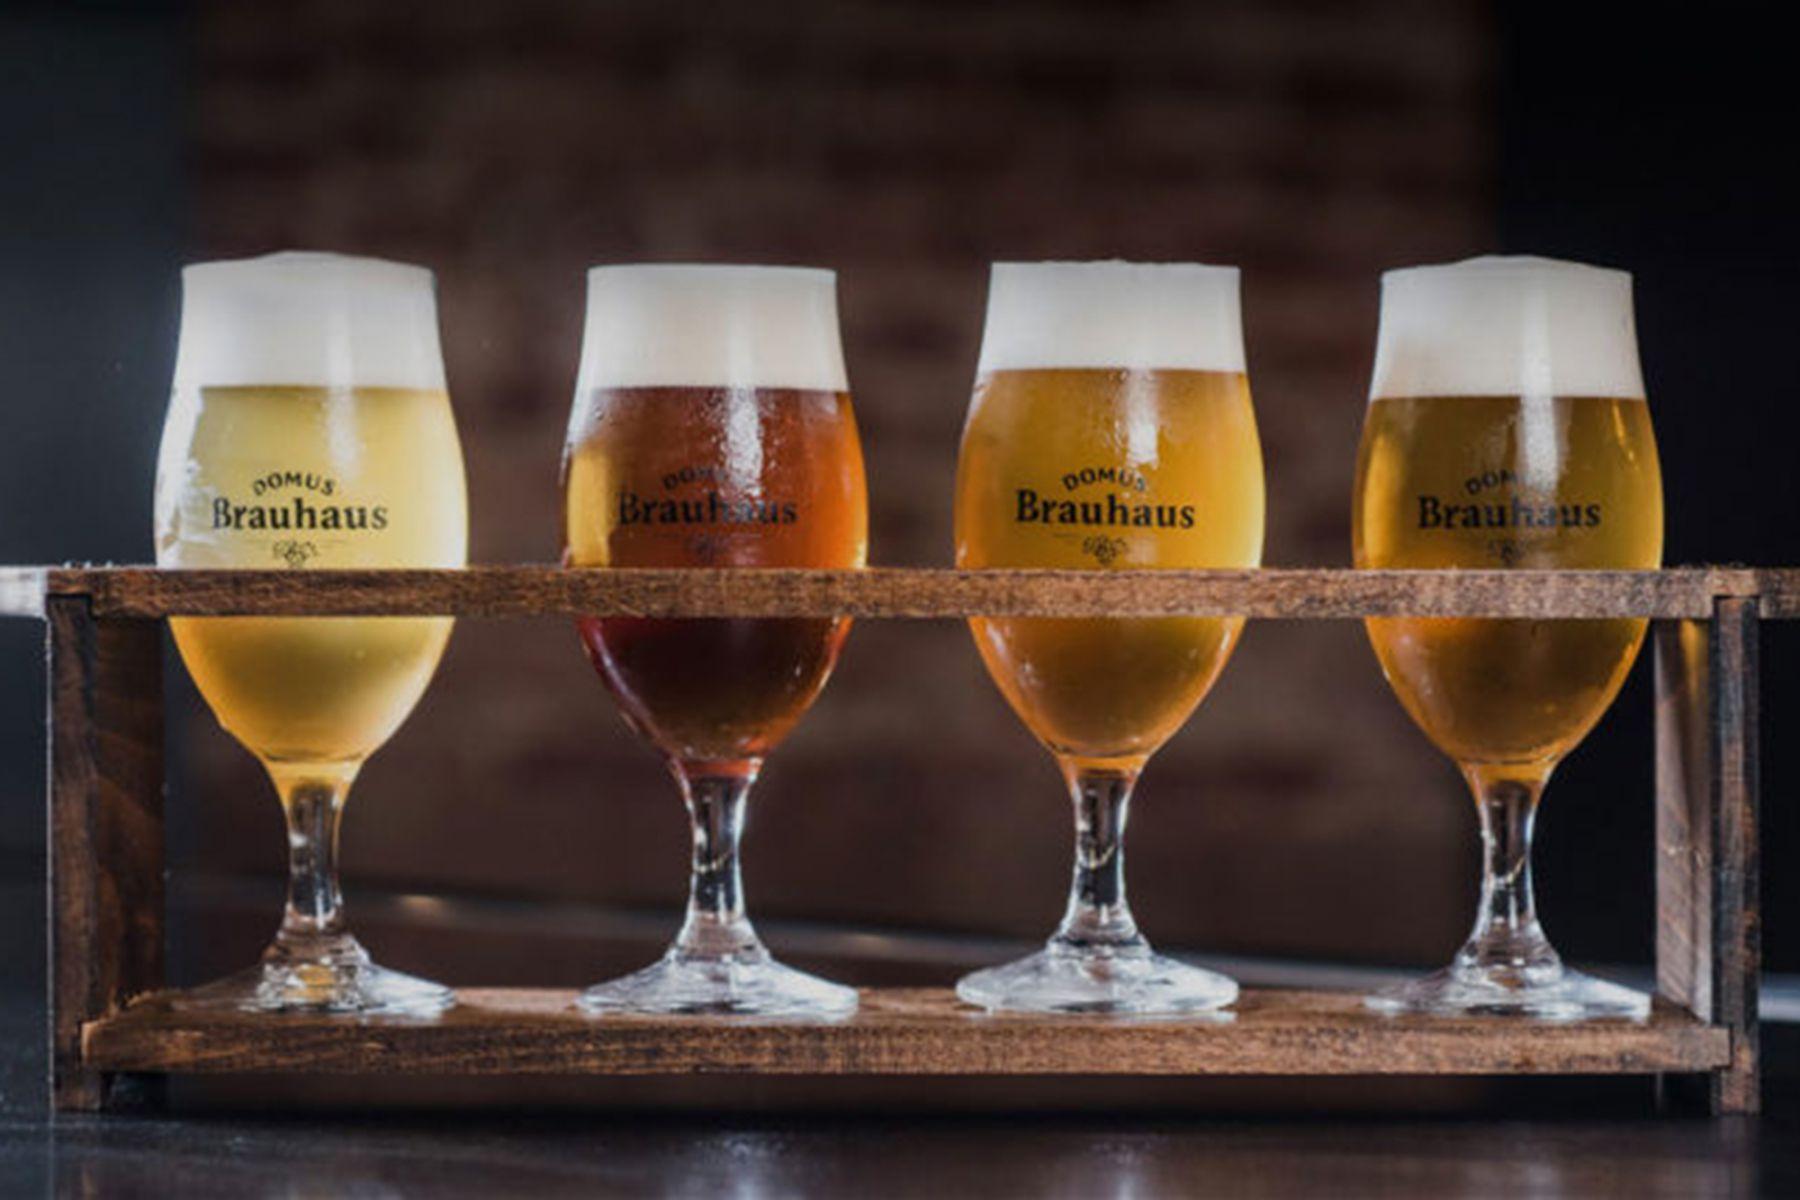 Proefbedje met biertjes van Domus | credit: Brauhaus Domus